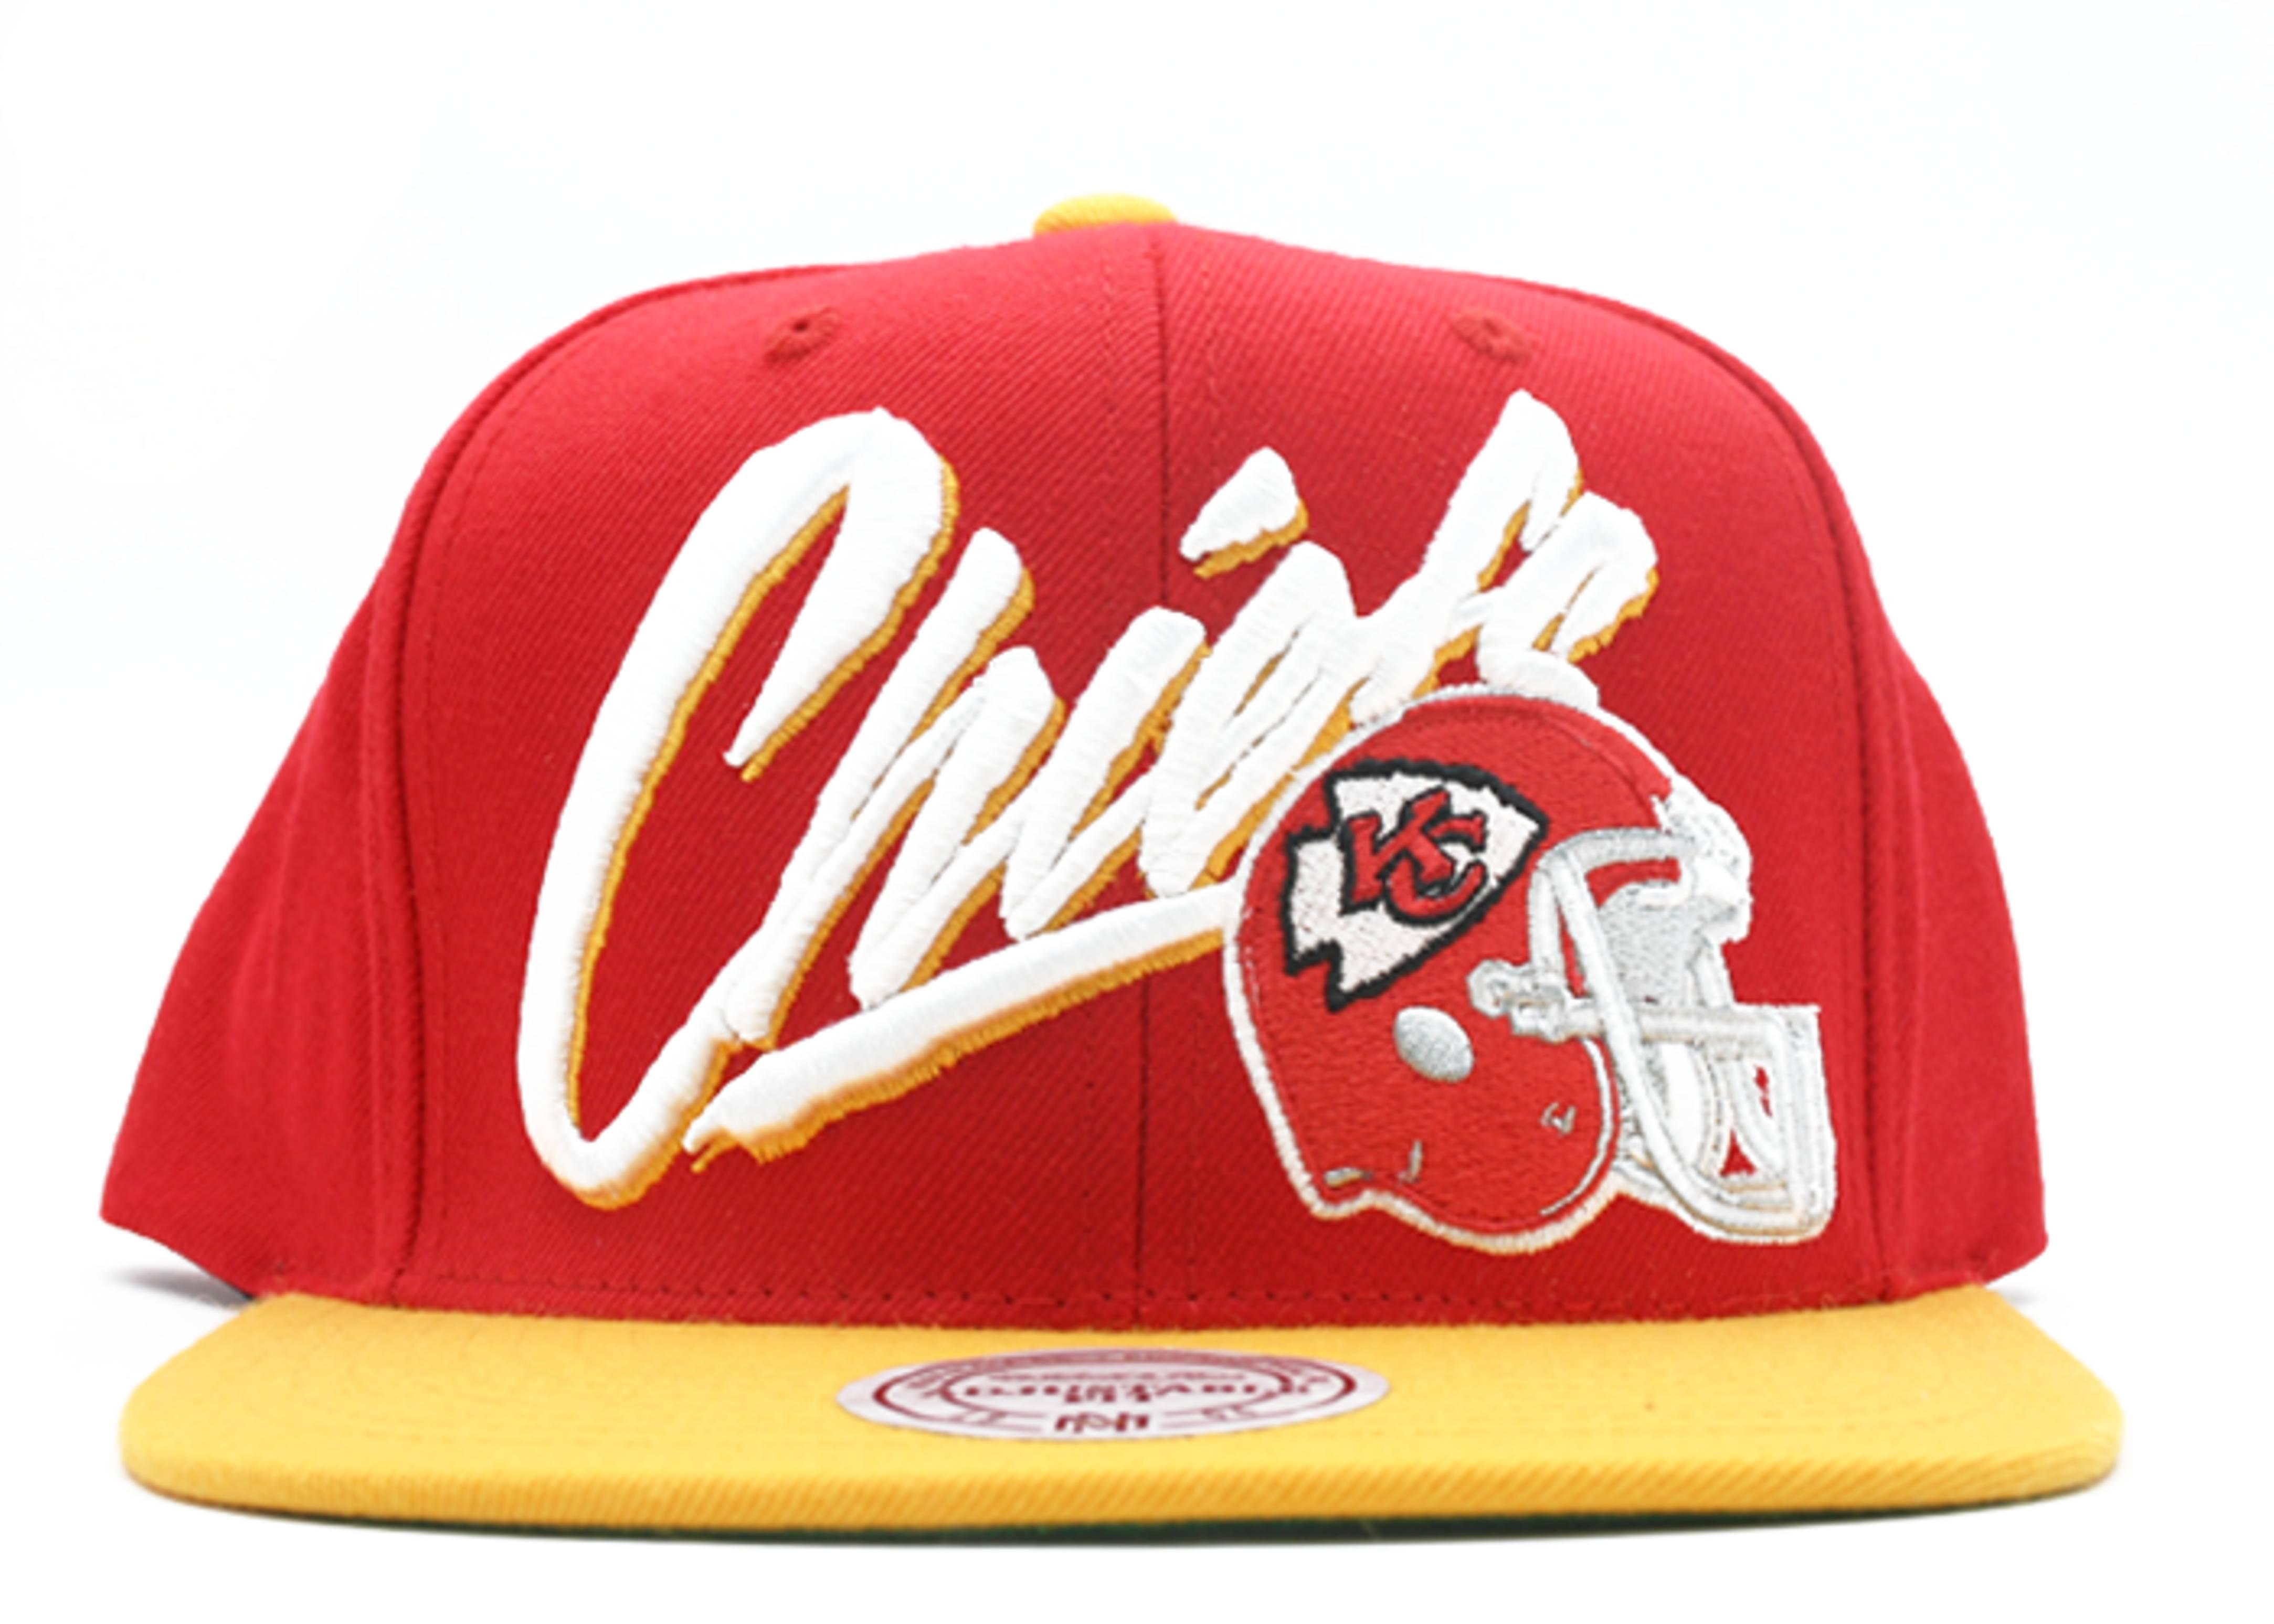 low priced 1a9b0 356d6 Kansas City Chiefs Snap-back - Mitchell & Ness ...